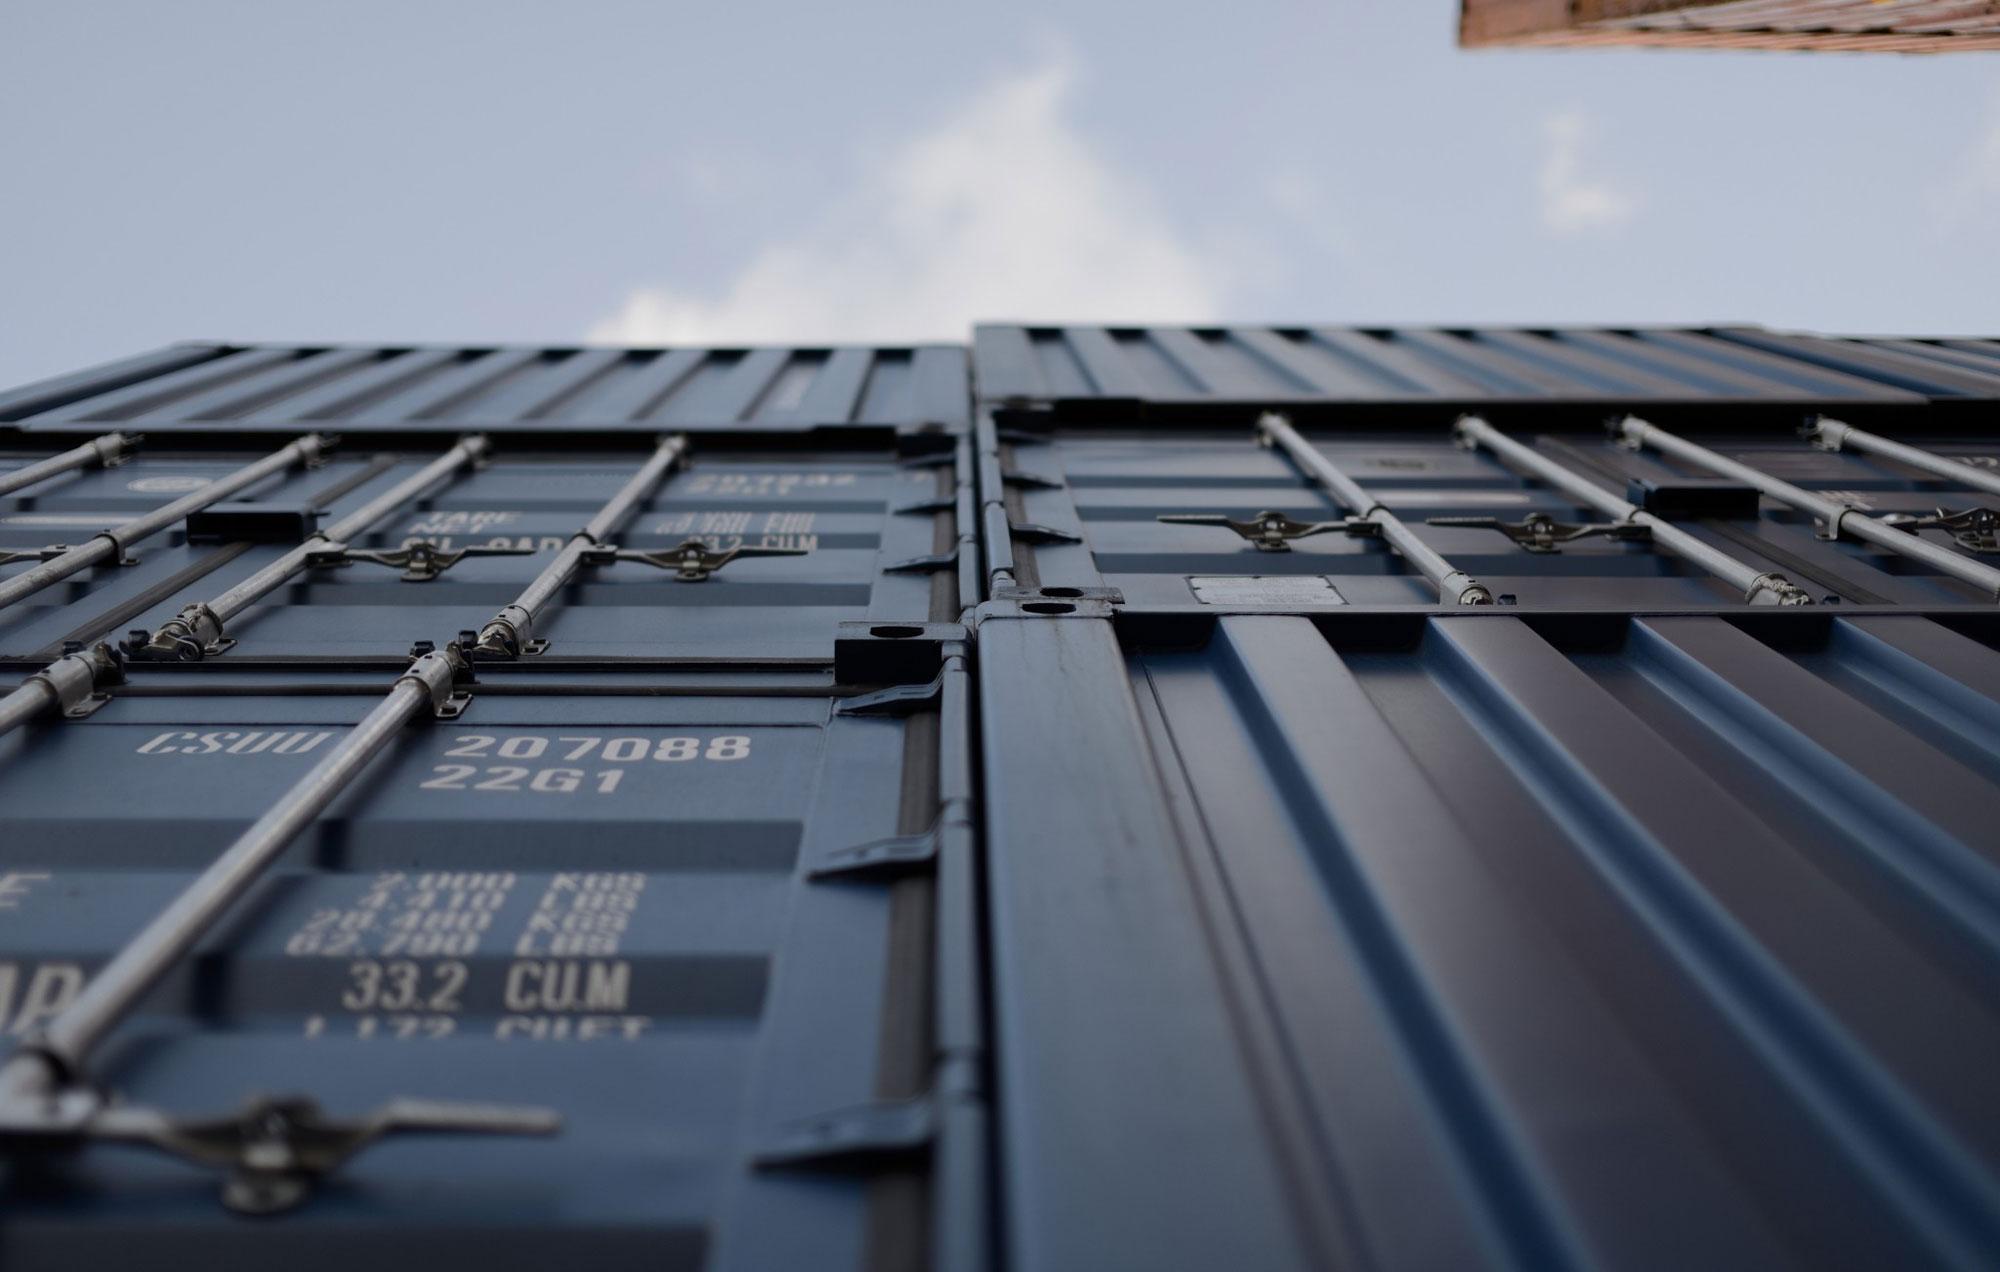 CST Container Hamburg Handel, Vertrieb, Vermietung, Reparatur